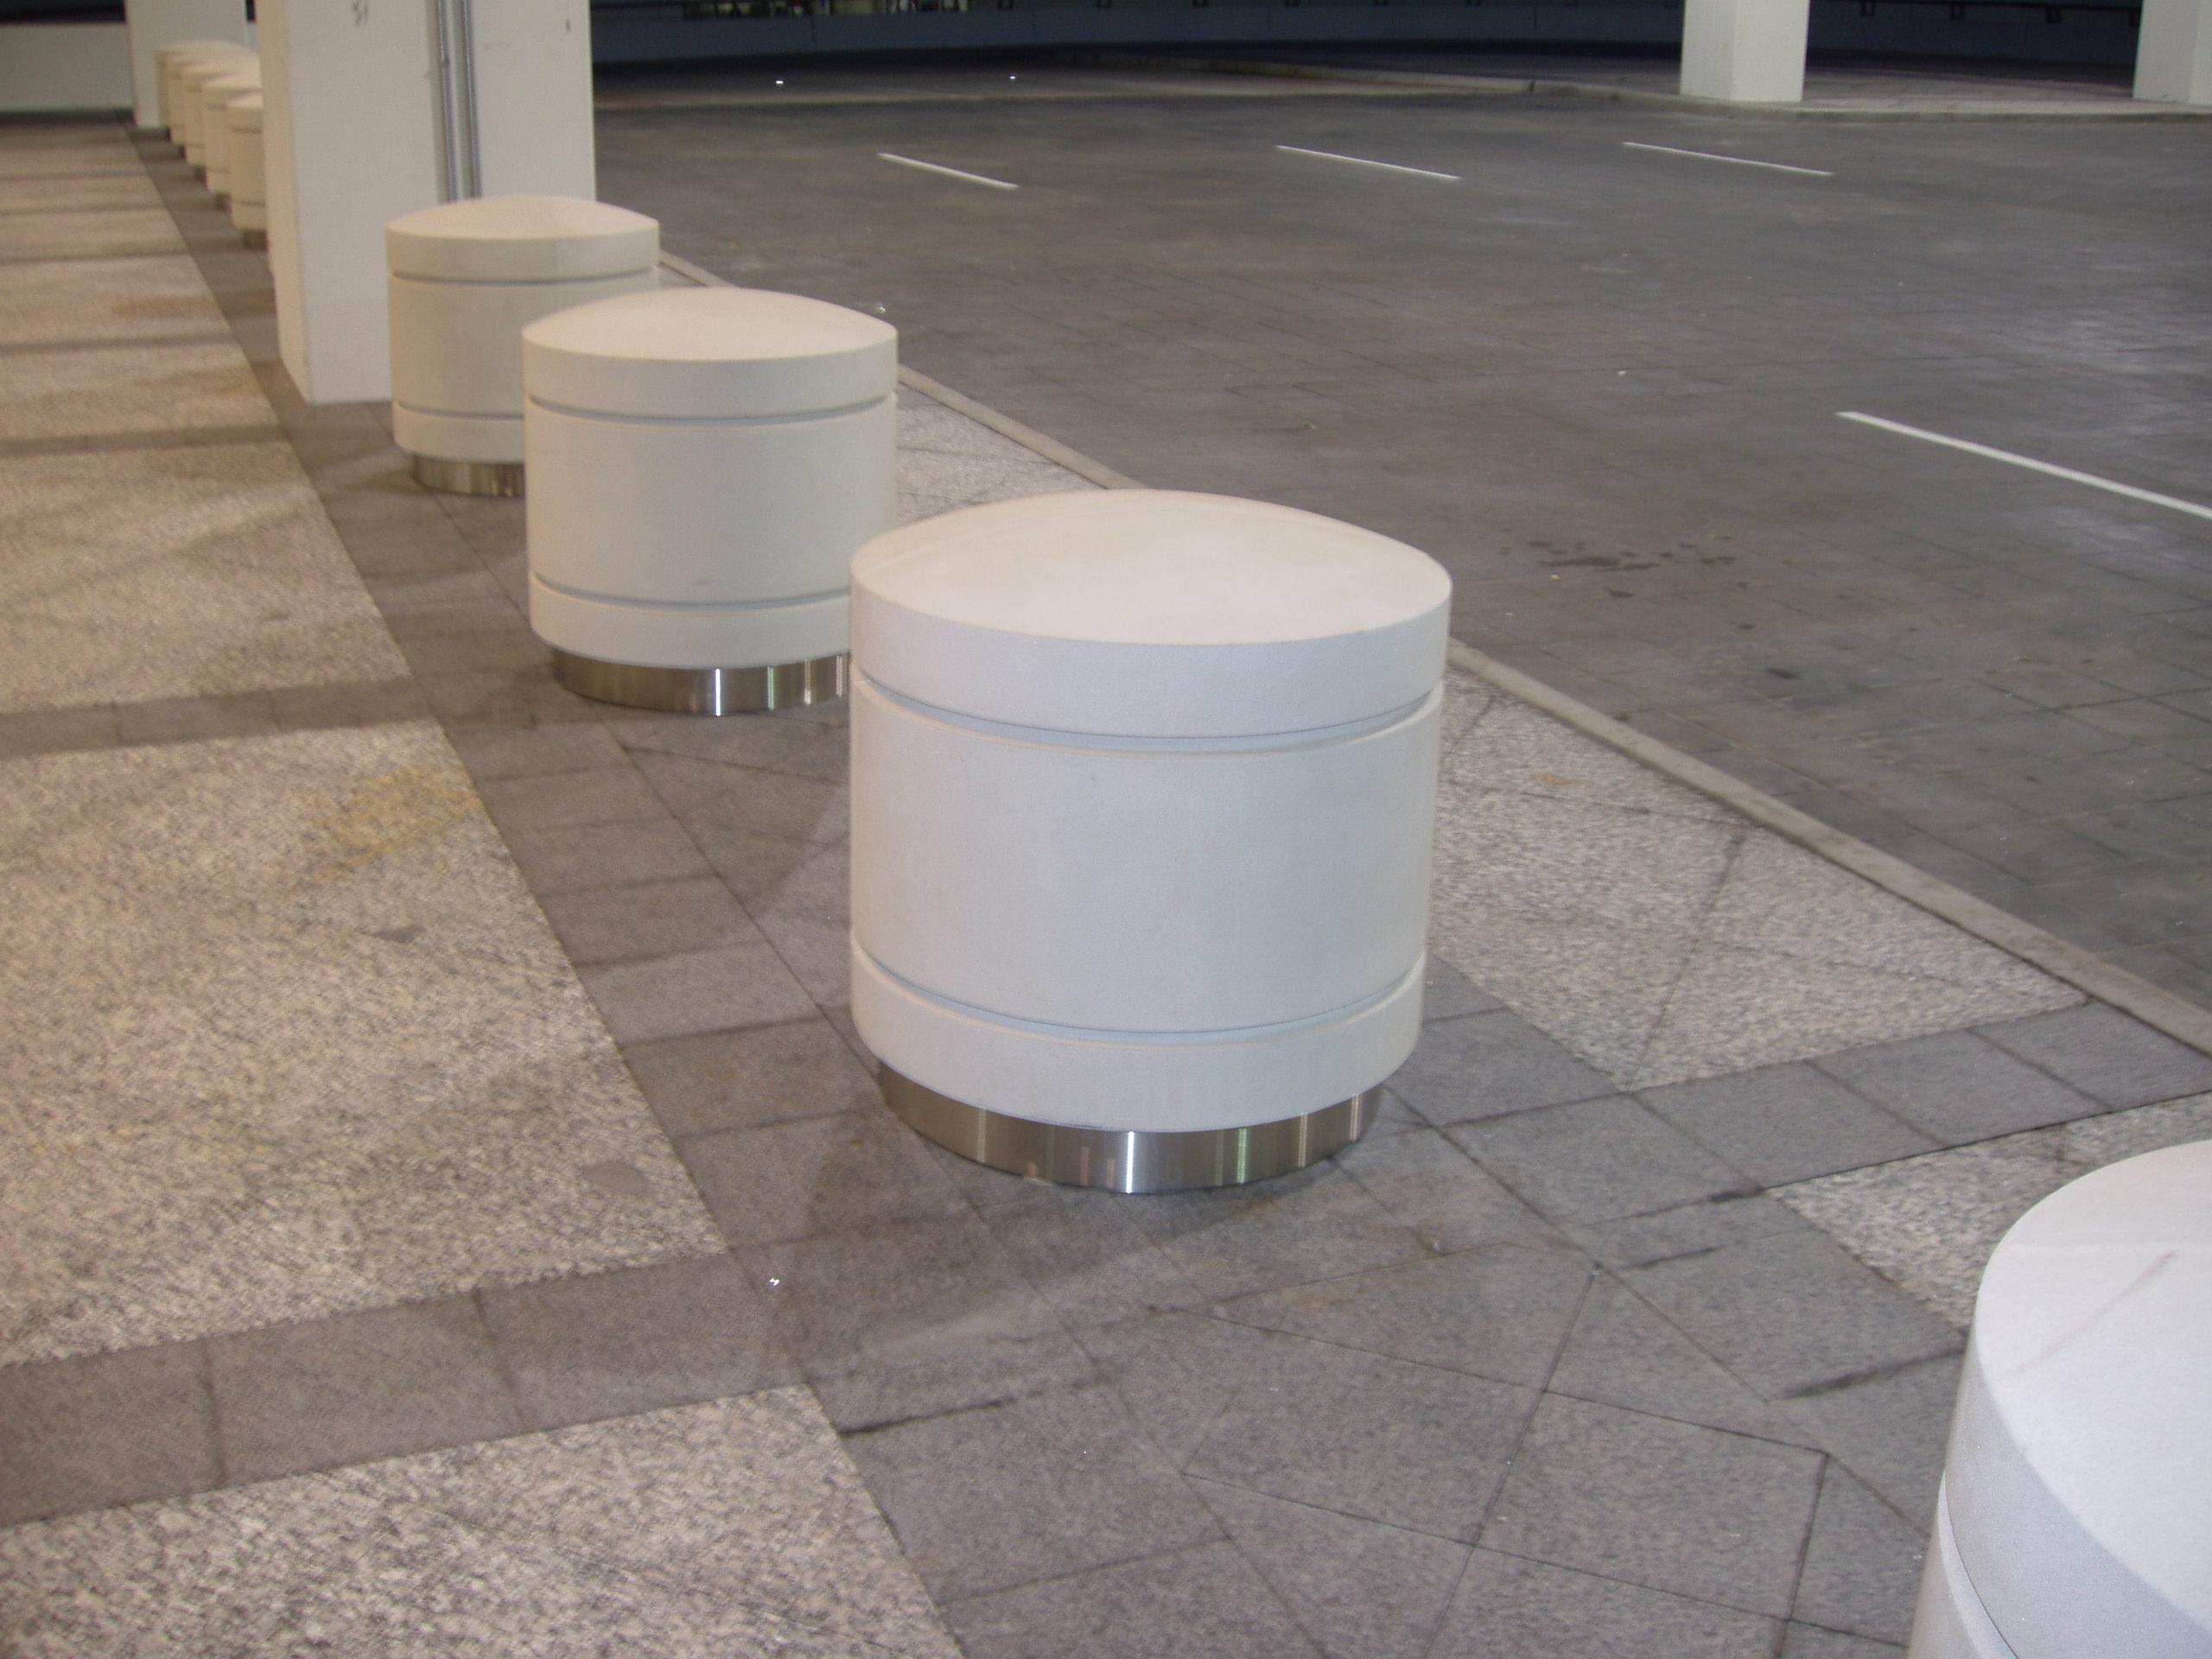 Permanent Architectural Fiberglass Bollards